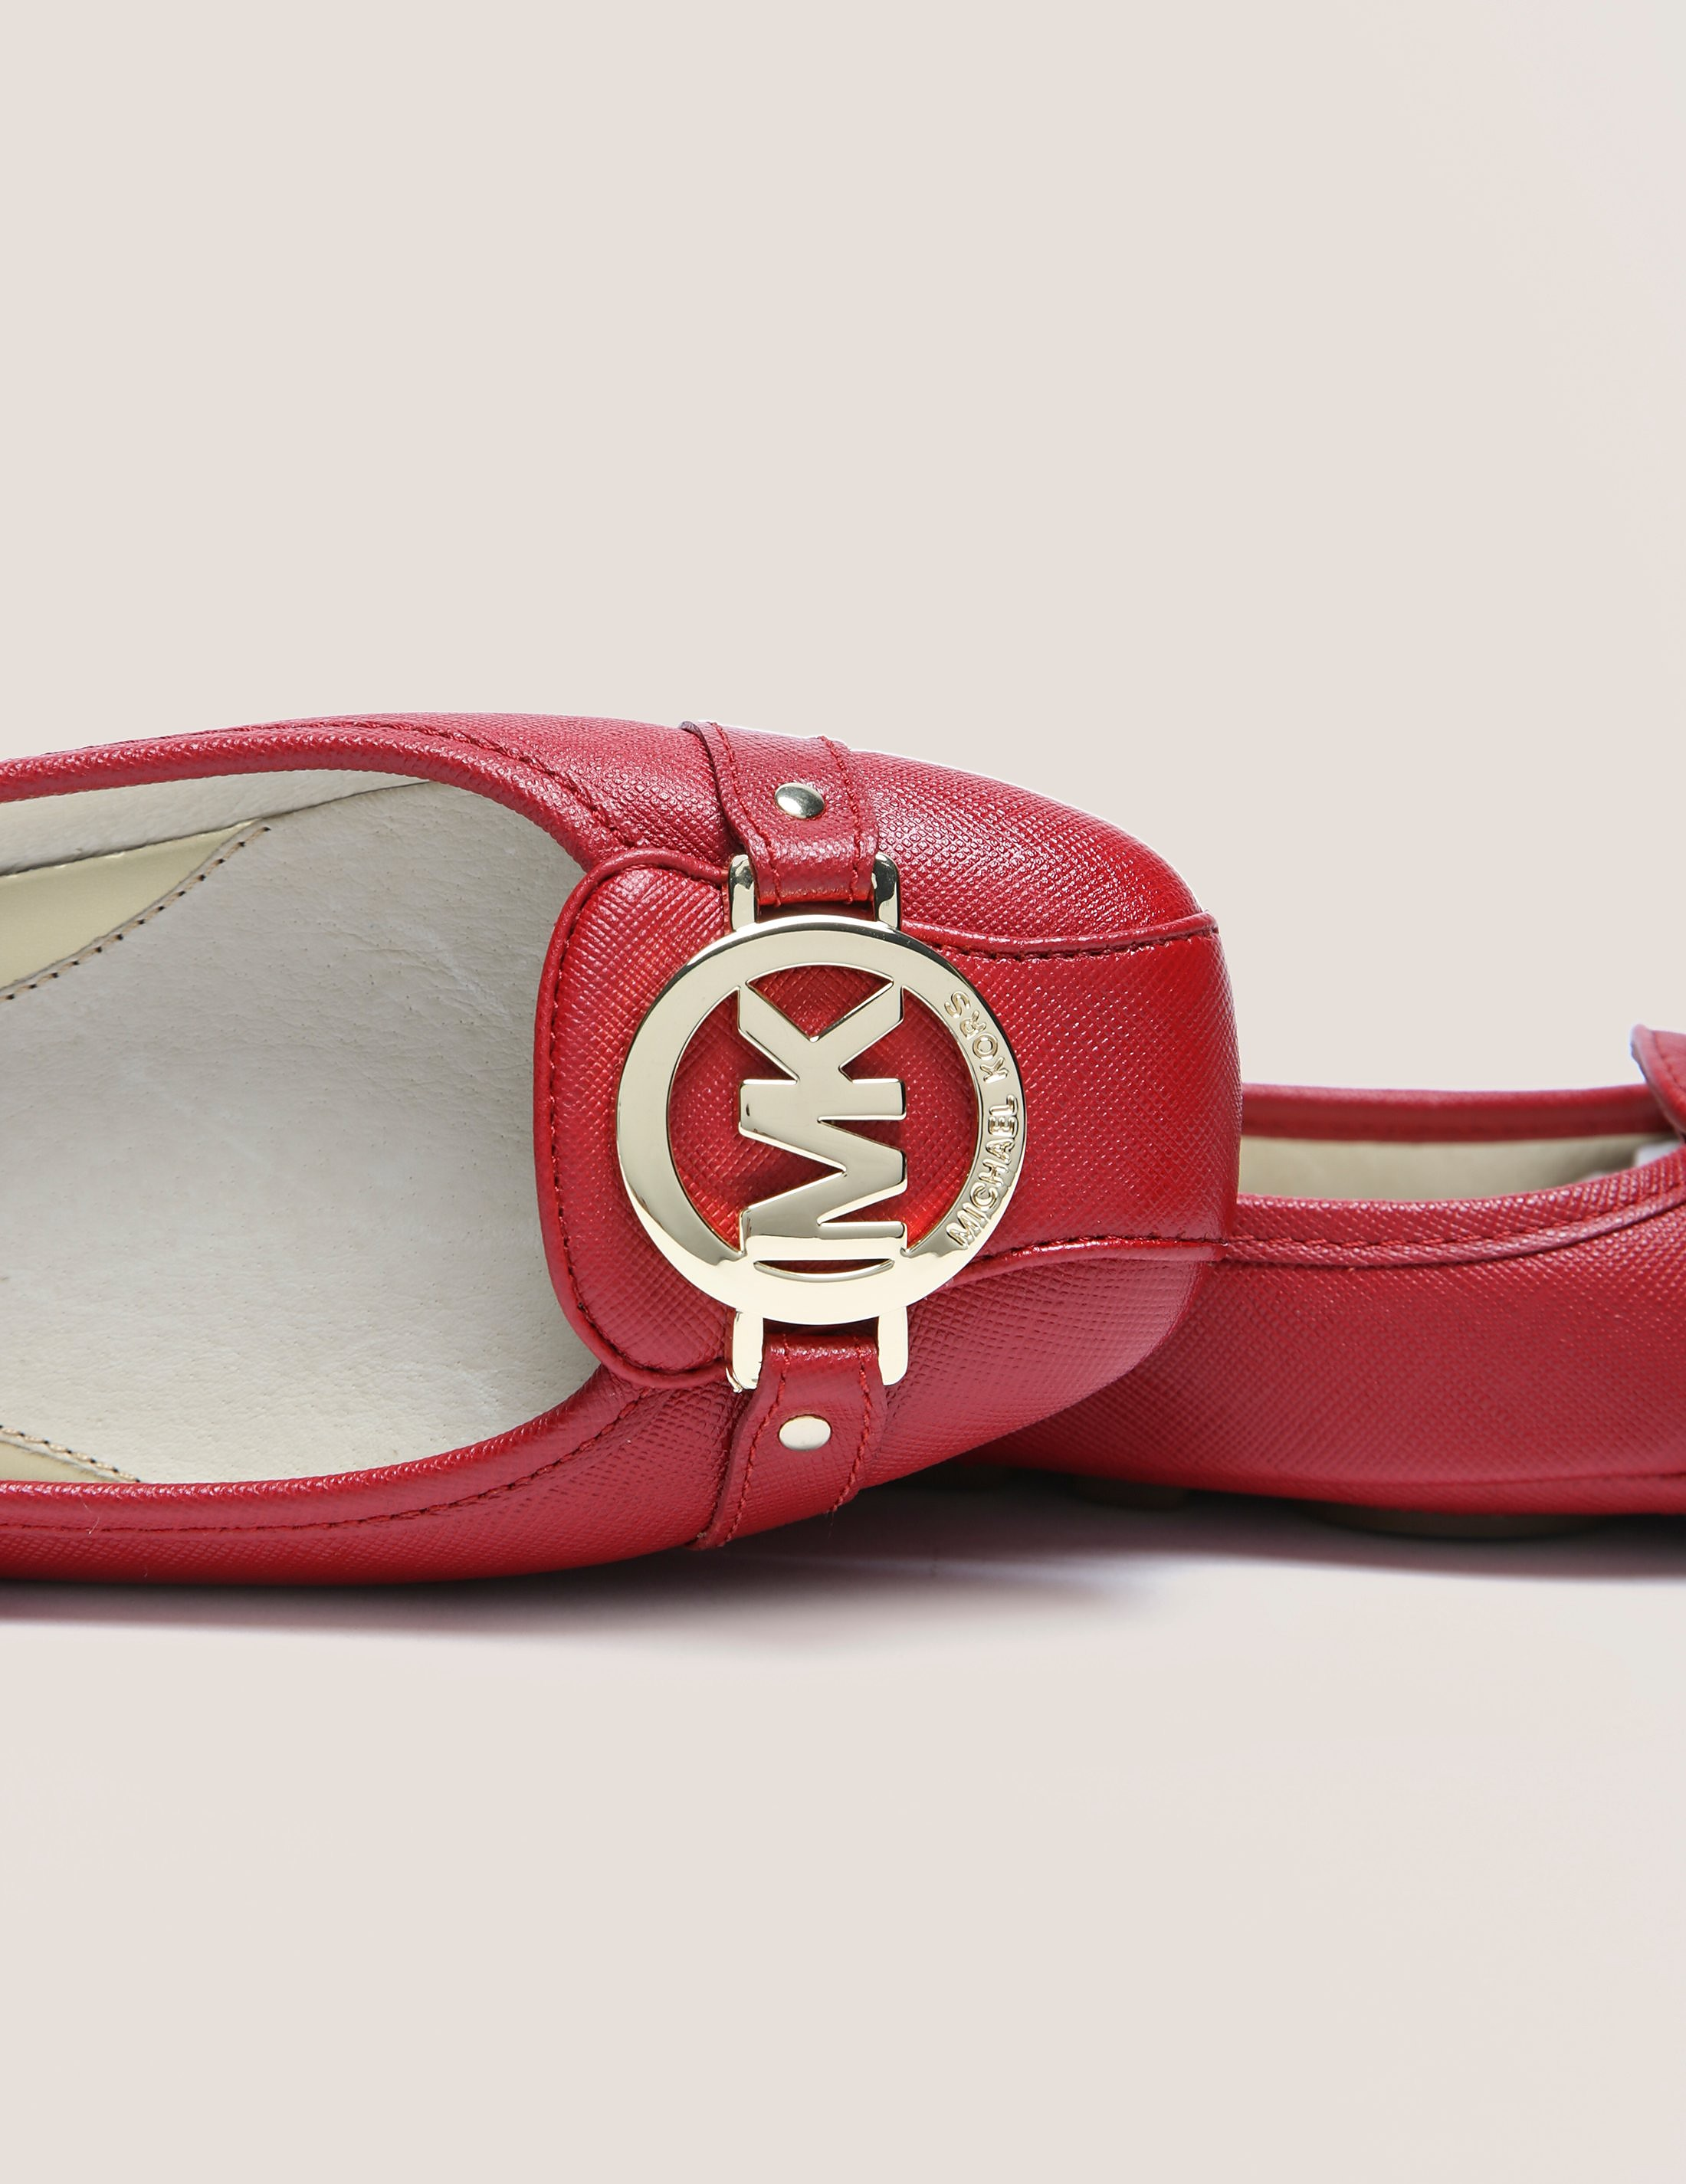 Michael Kors Fulton Driver Shoe